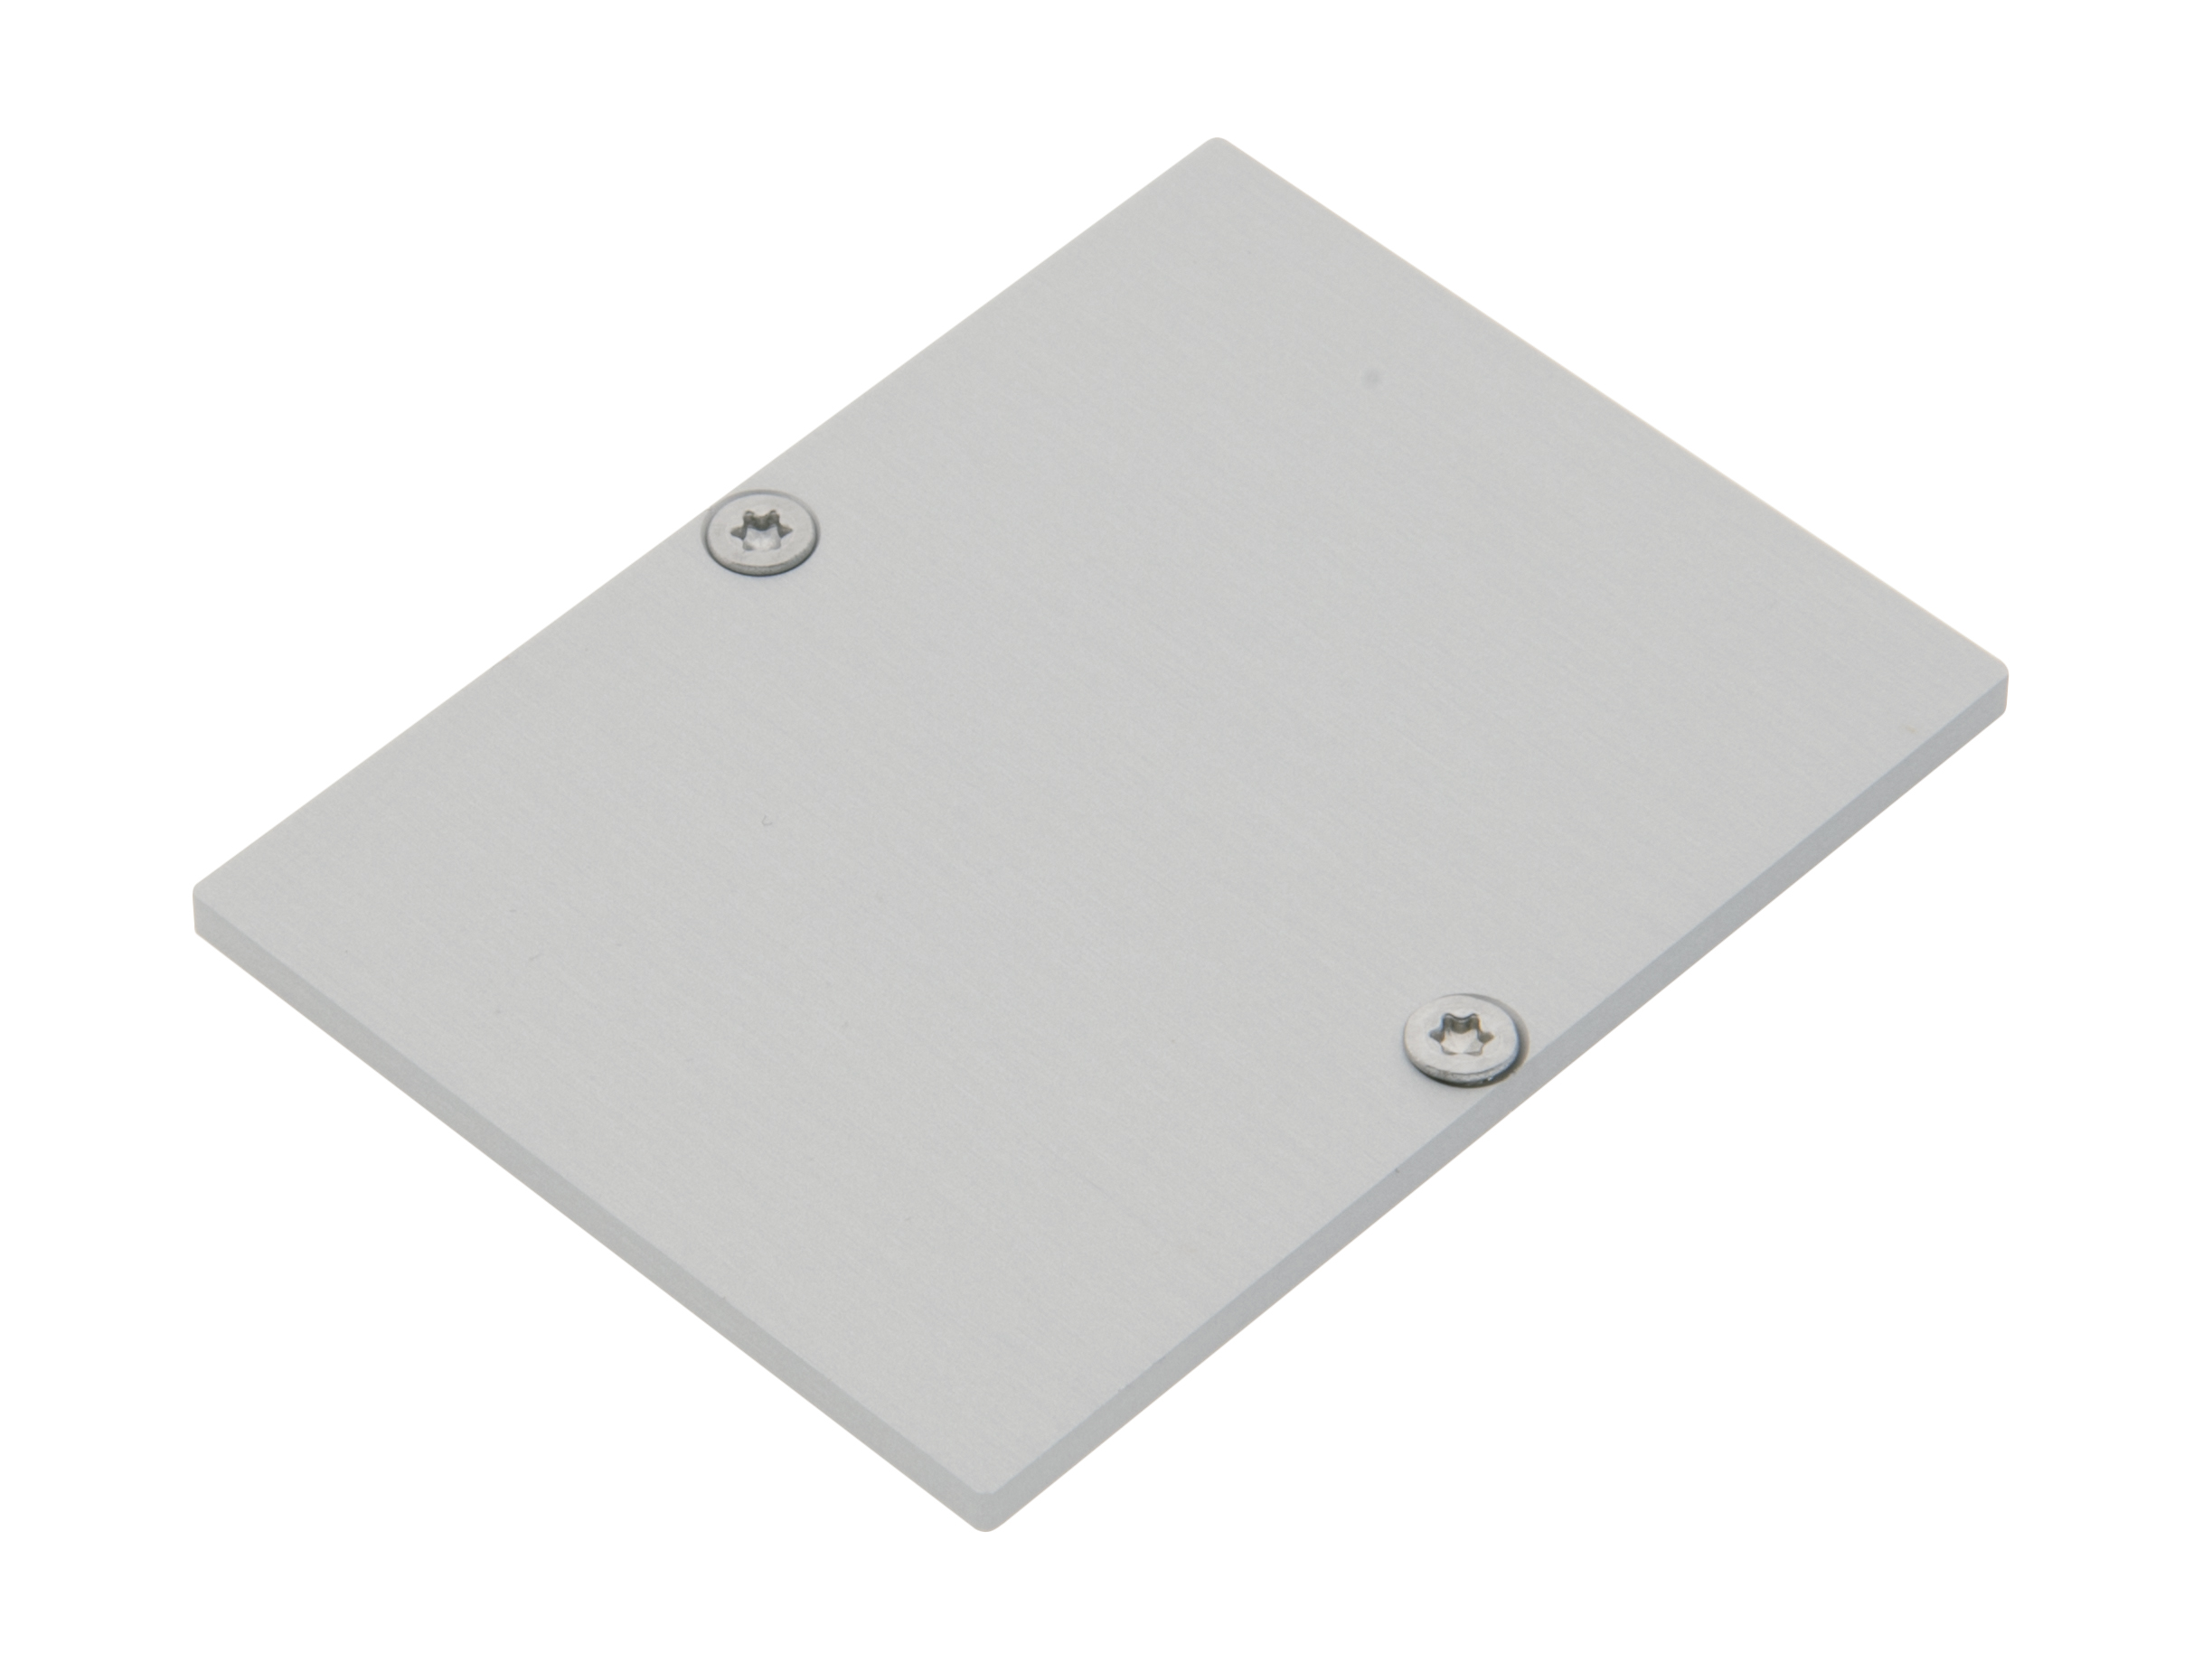 Profil Endkappe MFR Flach inkl. Schrauben